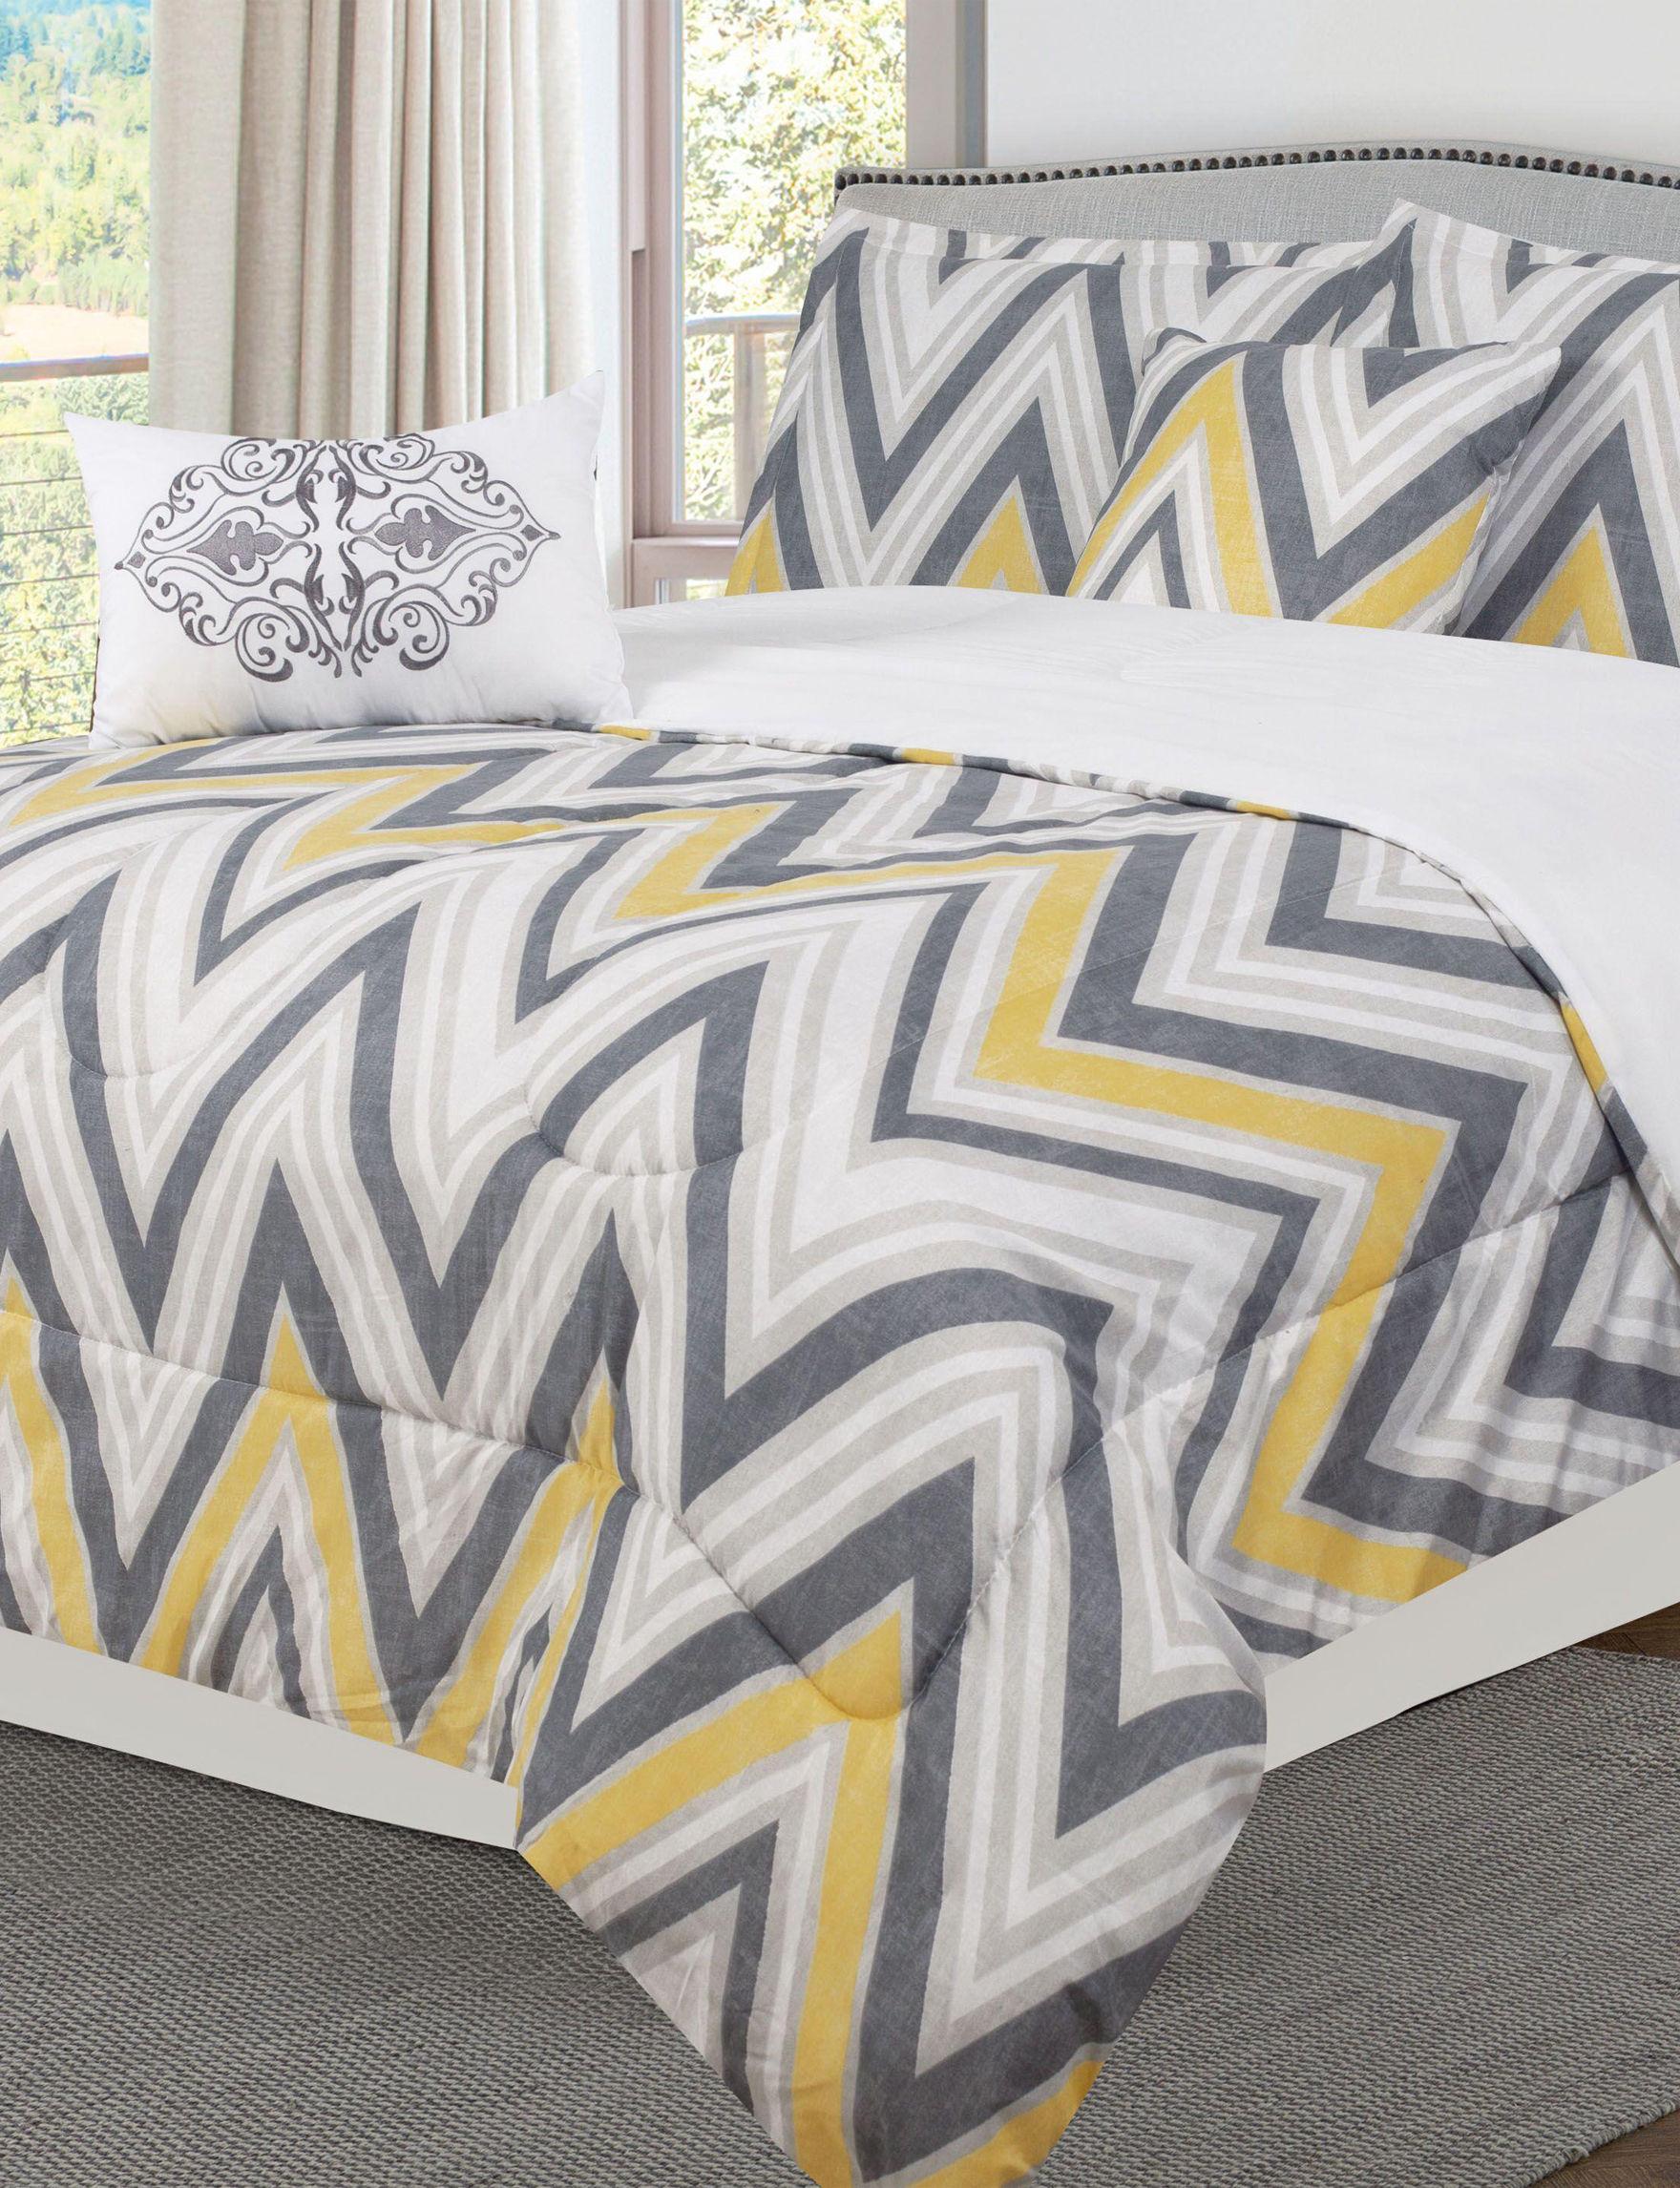 Bibbs Home White Chevron Comforters & Comforter Sets